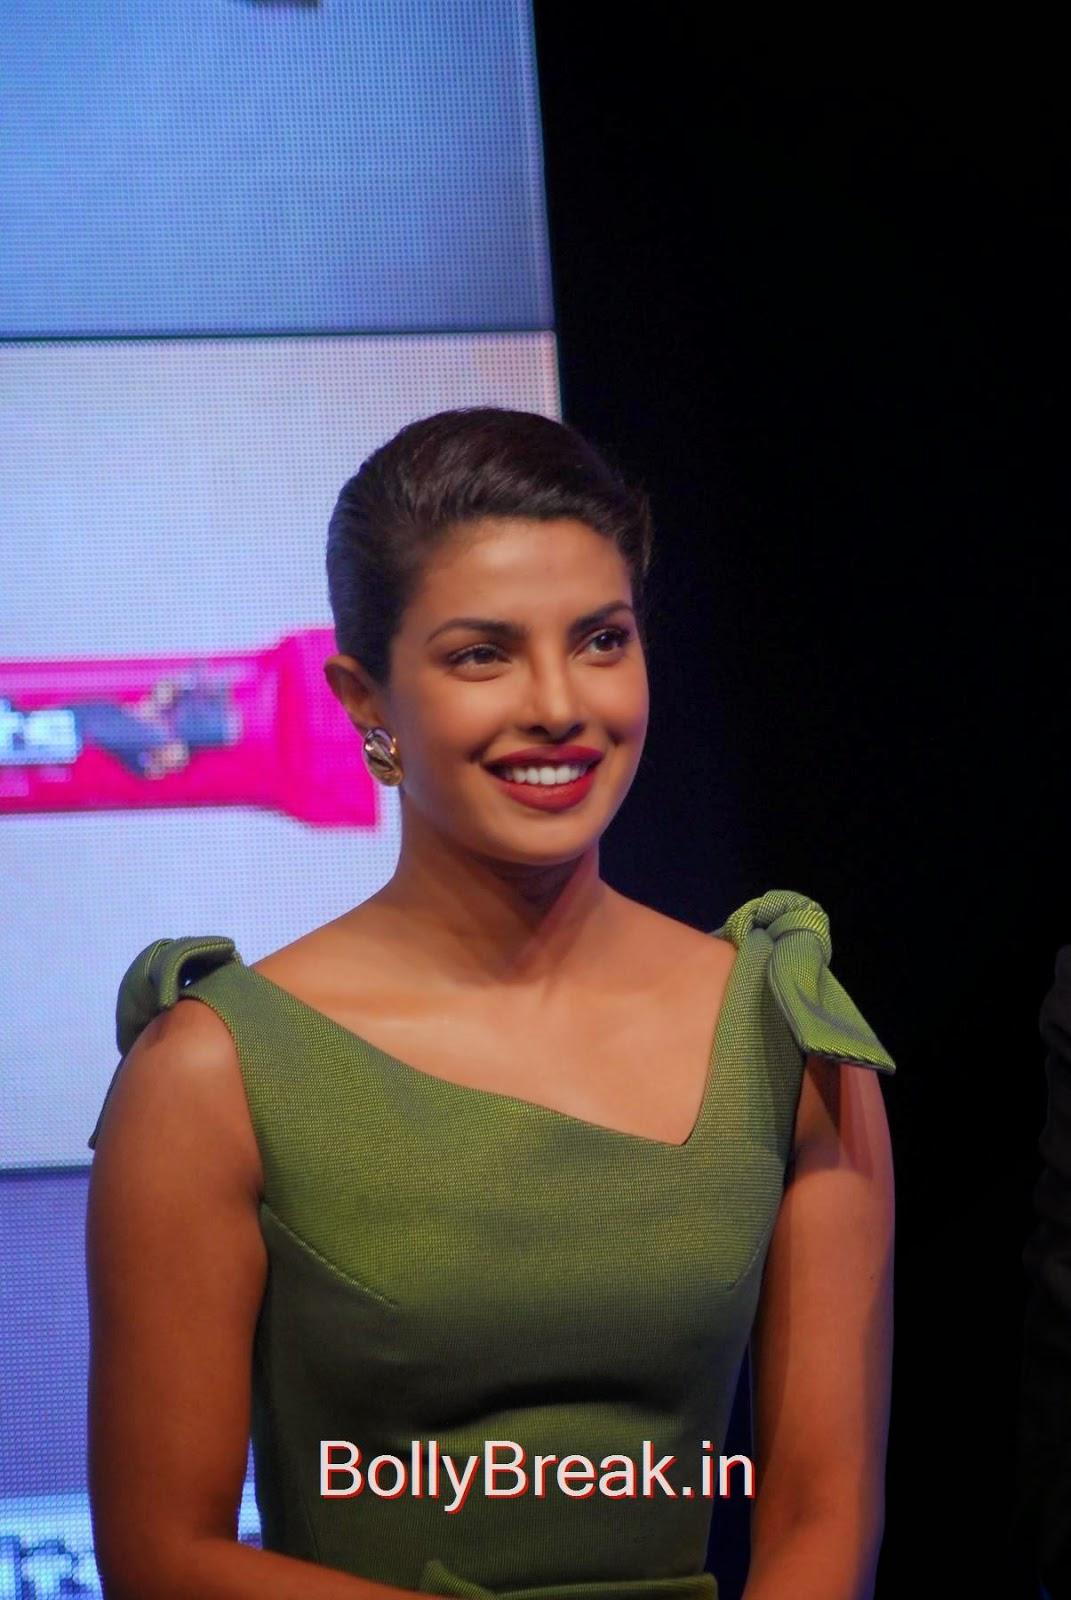 Priyanka Chopra Photo Gallery with no Watermarks, Priyanka Chopra Hot Pics in green dress from Hoppit Chocolate Launch